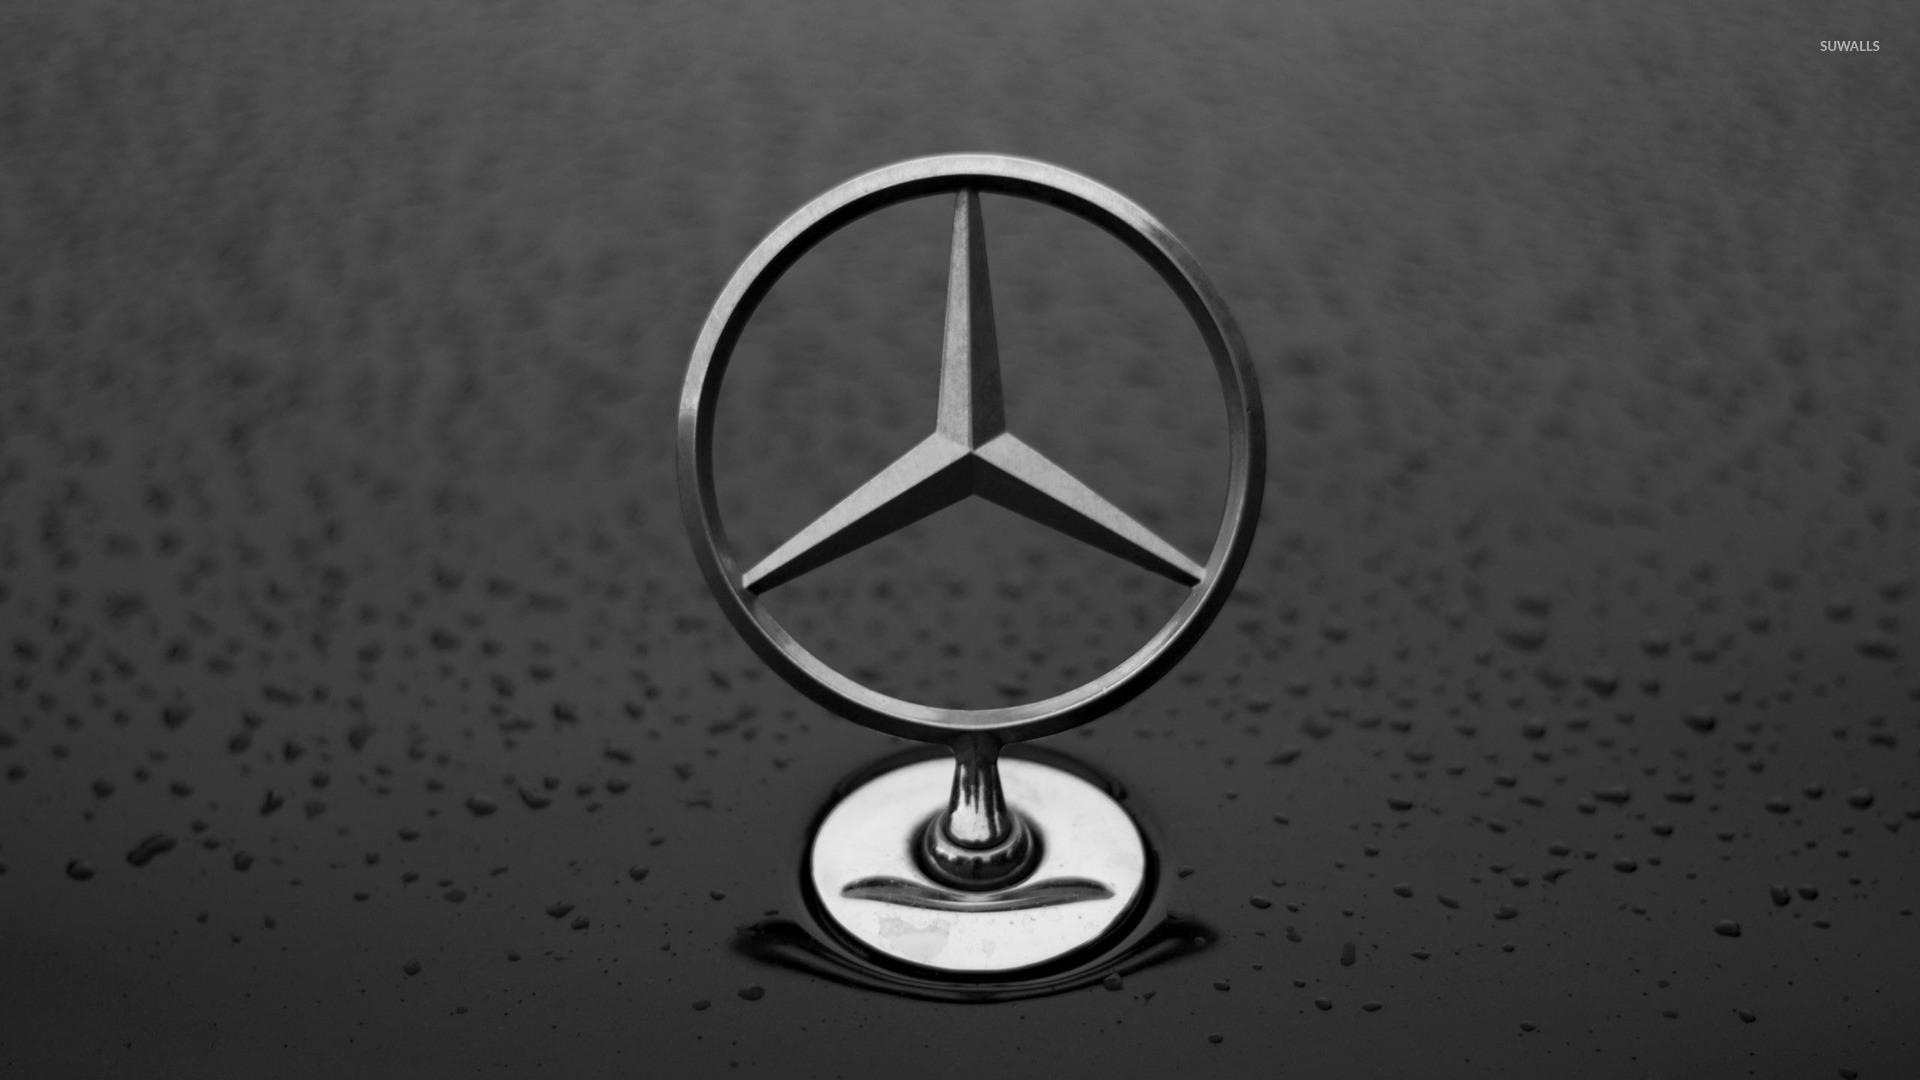 Lamborghini Cars Wallpapers Free Download Mercedes Benz Hood Ornament Wallpaper Car Wallpapers